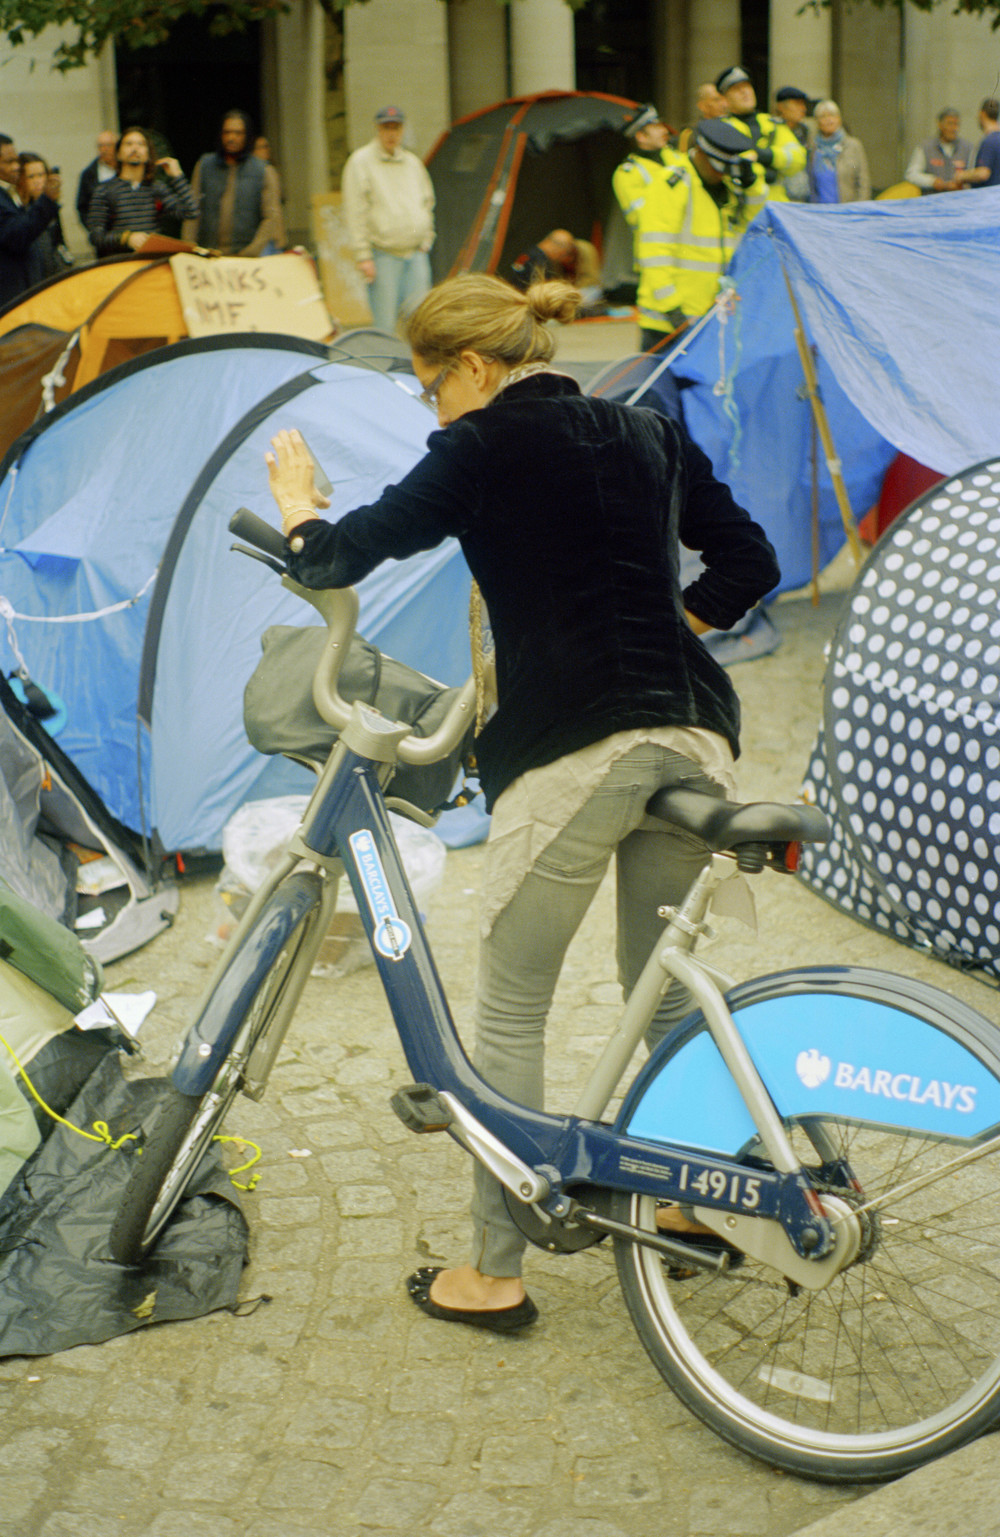 barcleysbike.jpg